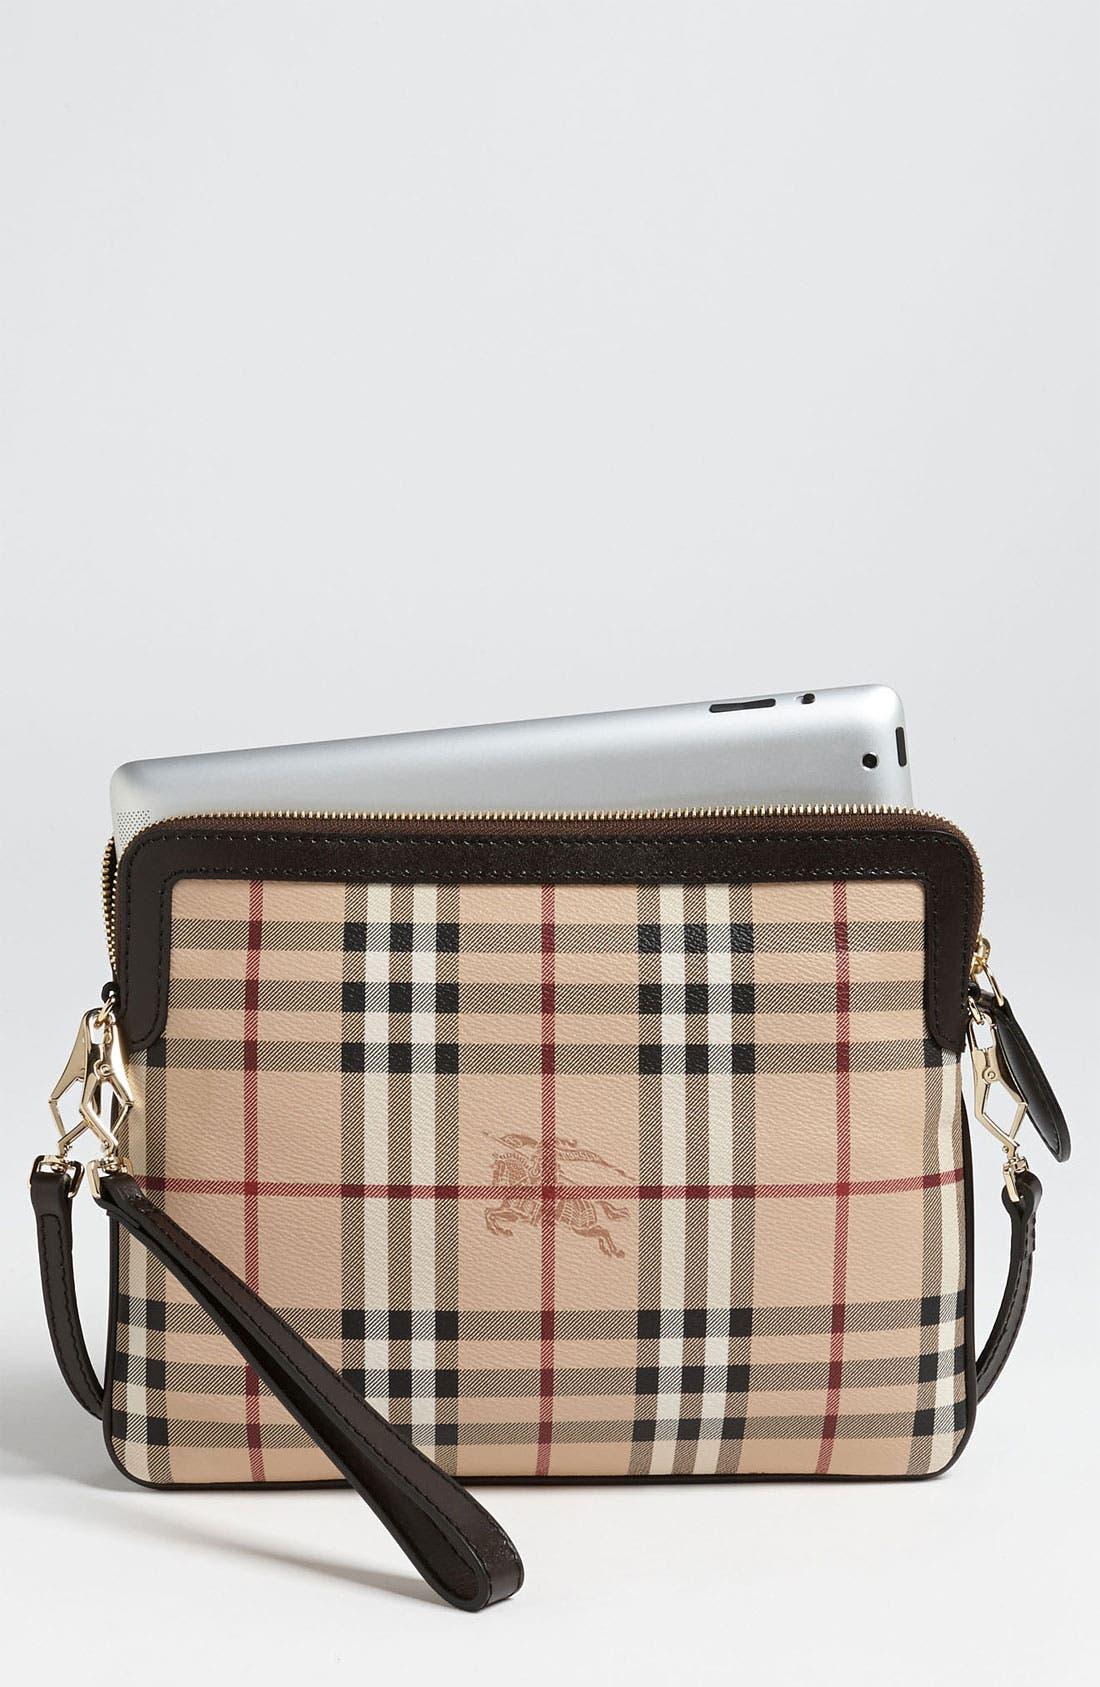 Alternate Image 1 Selected - Burberry 'Haymarket Check' iPad Crossbody Bag